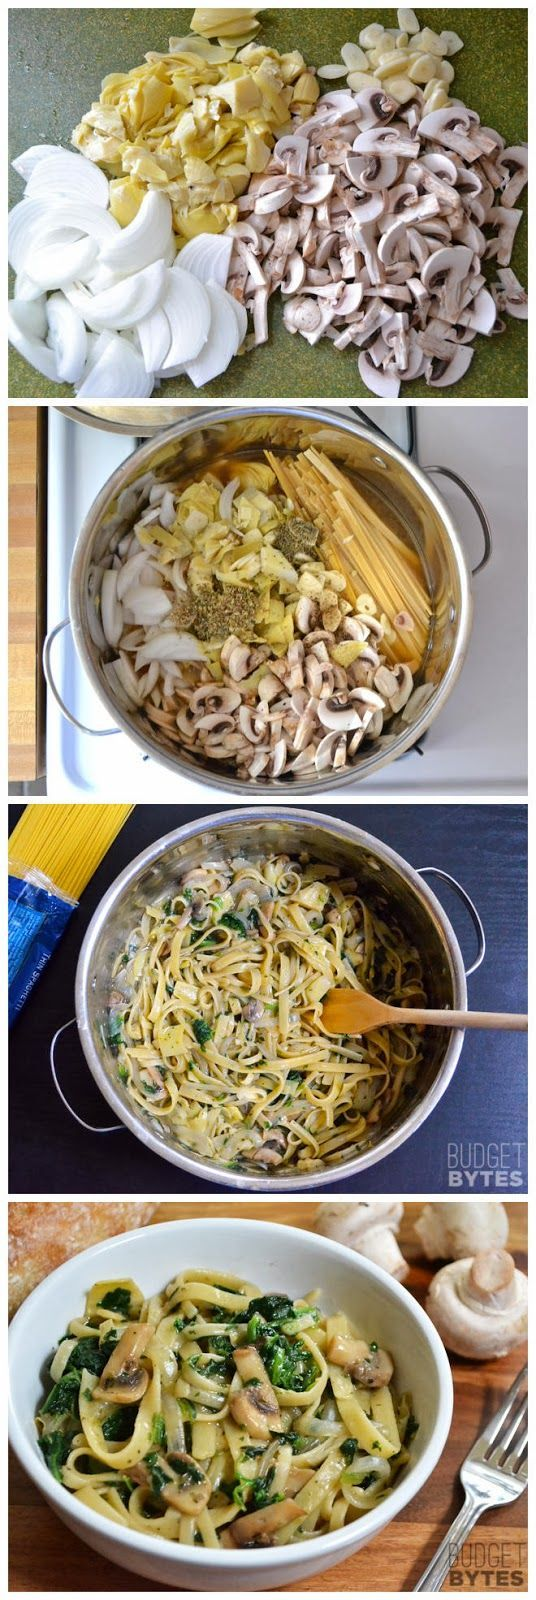 Spinach & Artichoke Wonderpot - one dish pasta with veggies, use wheat pasta